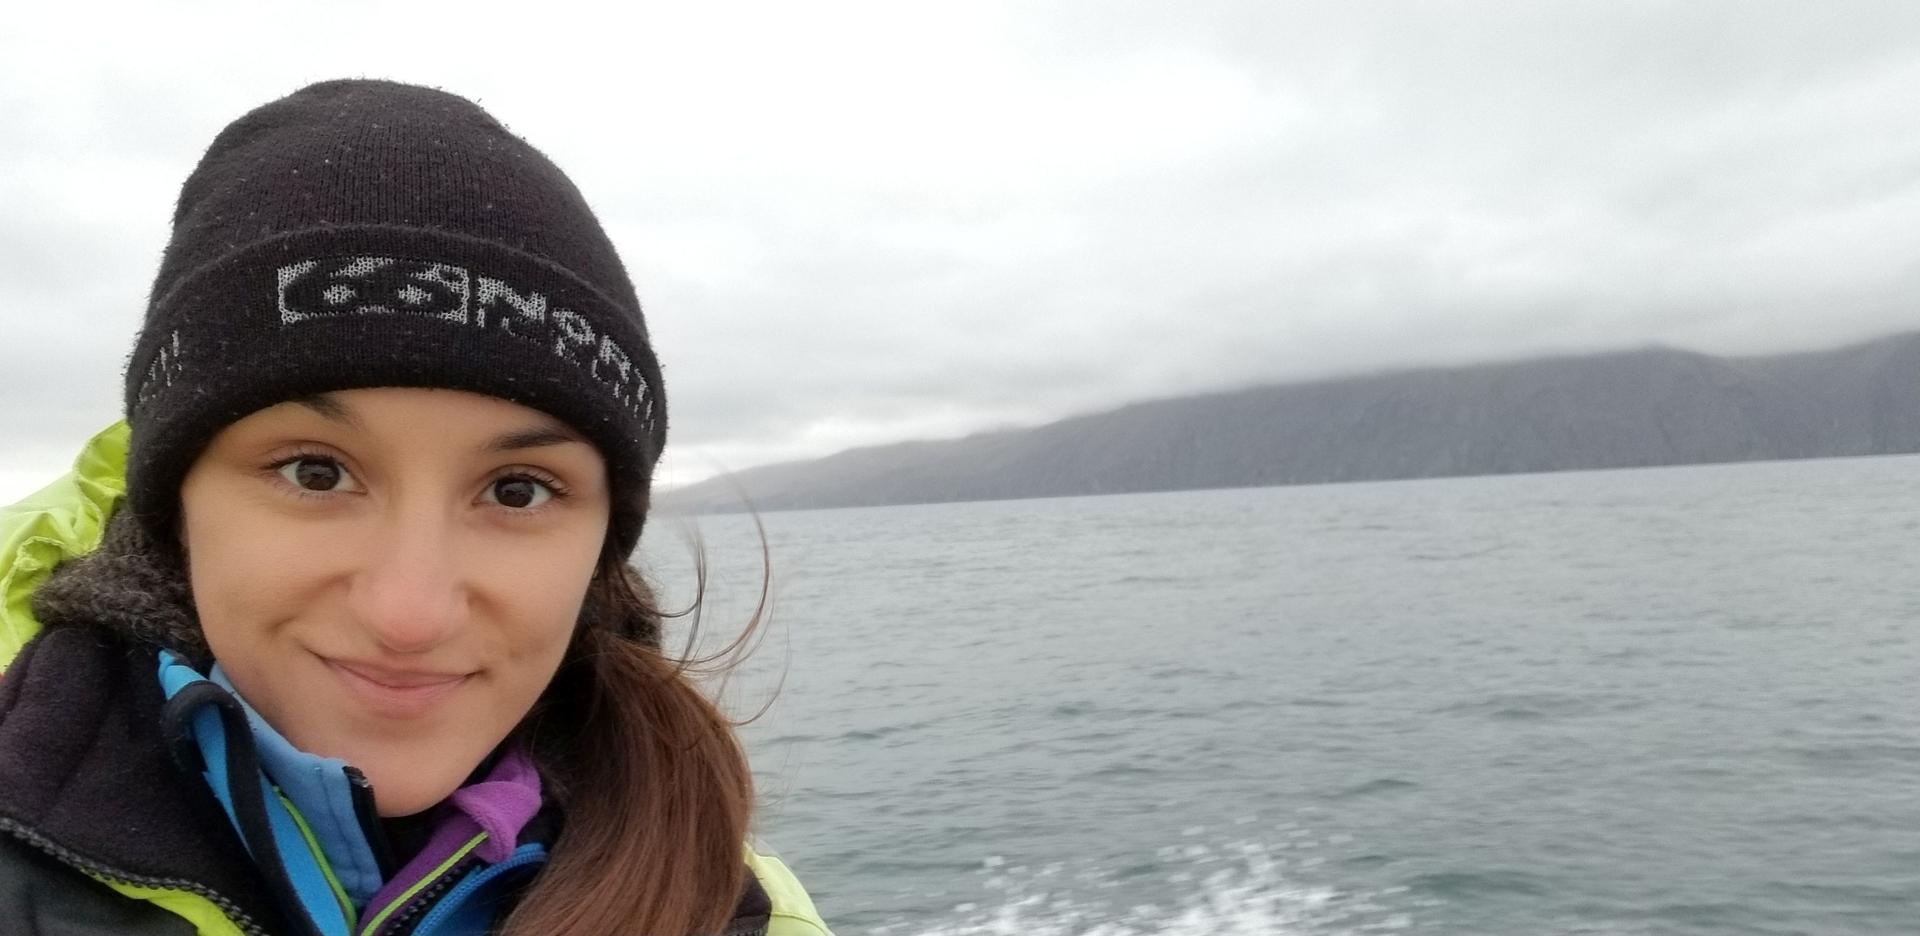 Charla Basran